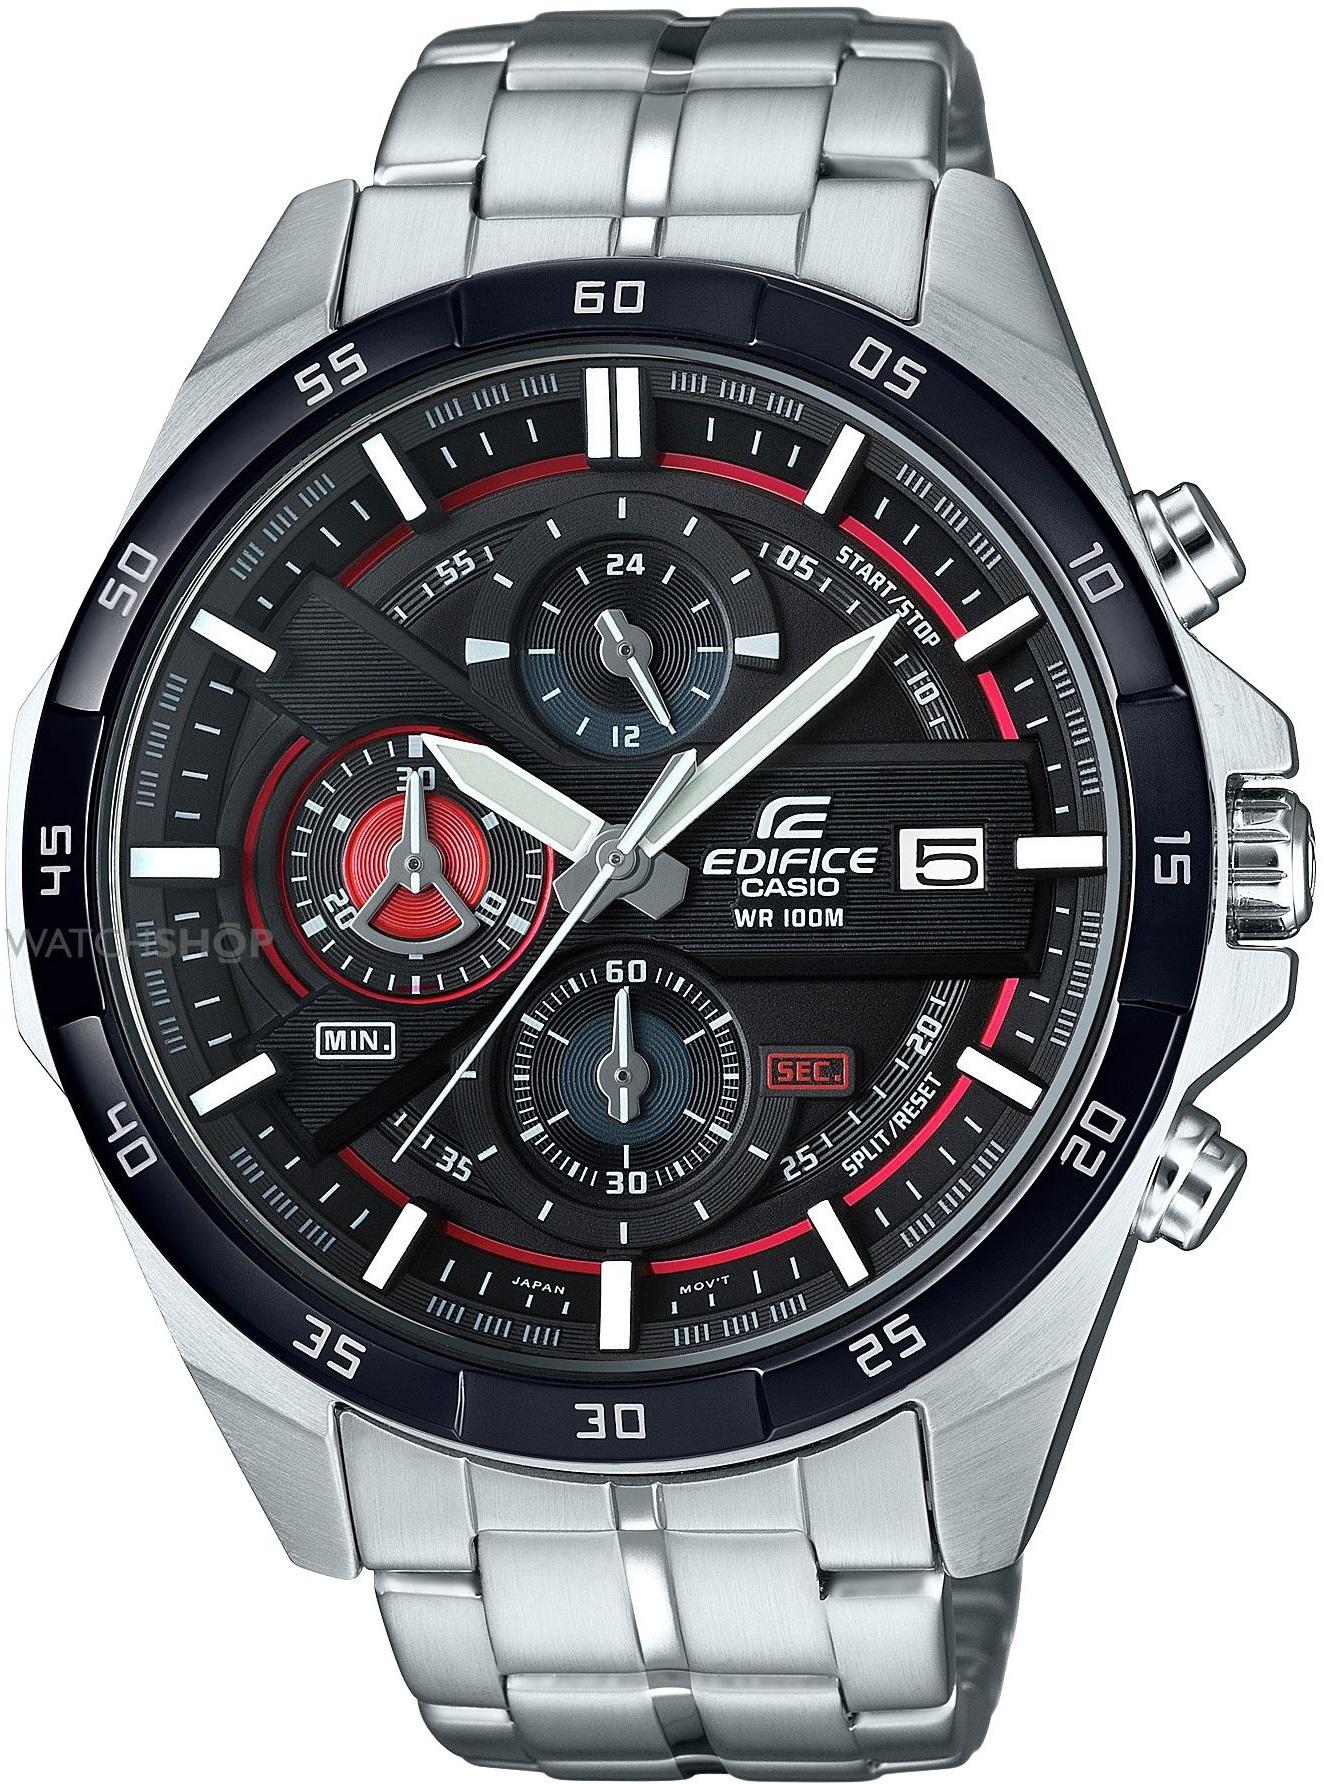 Мужские часы Casio Edifice EFR-556DB-1AVUEF